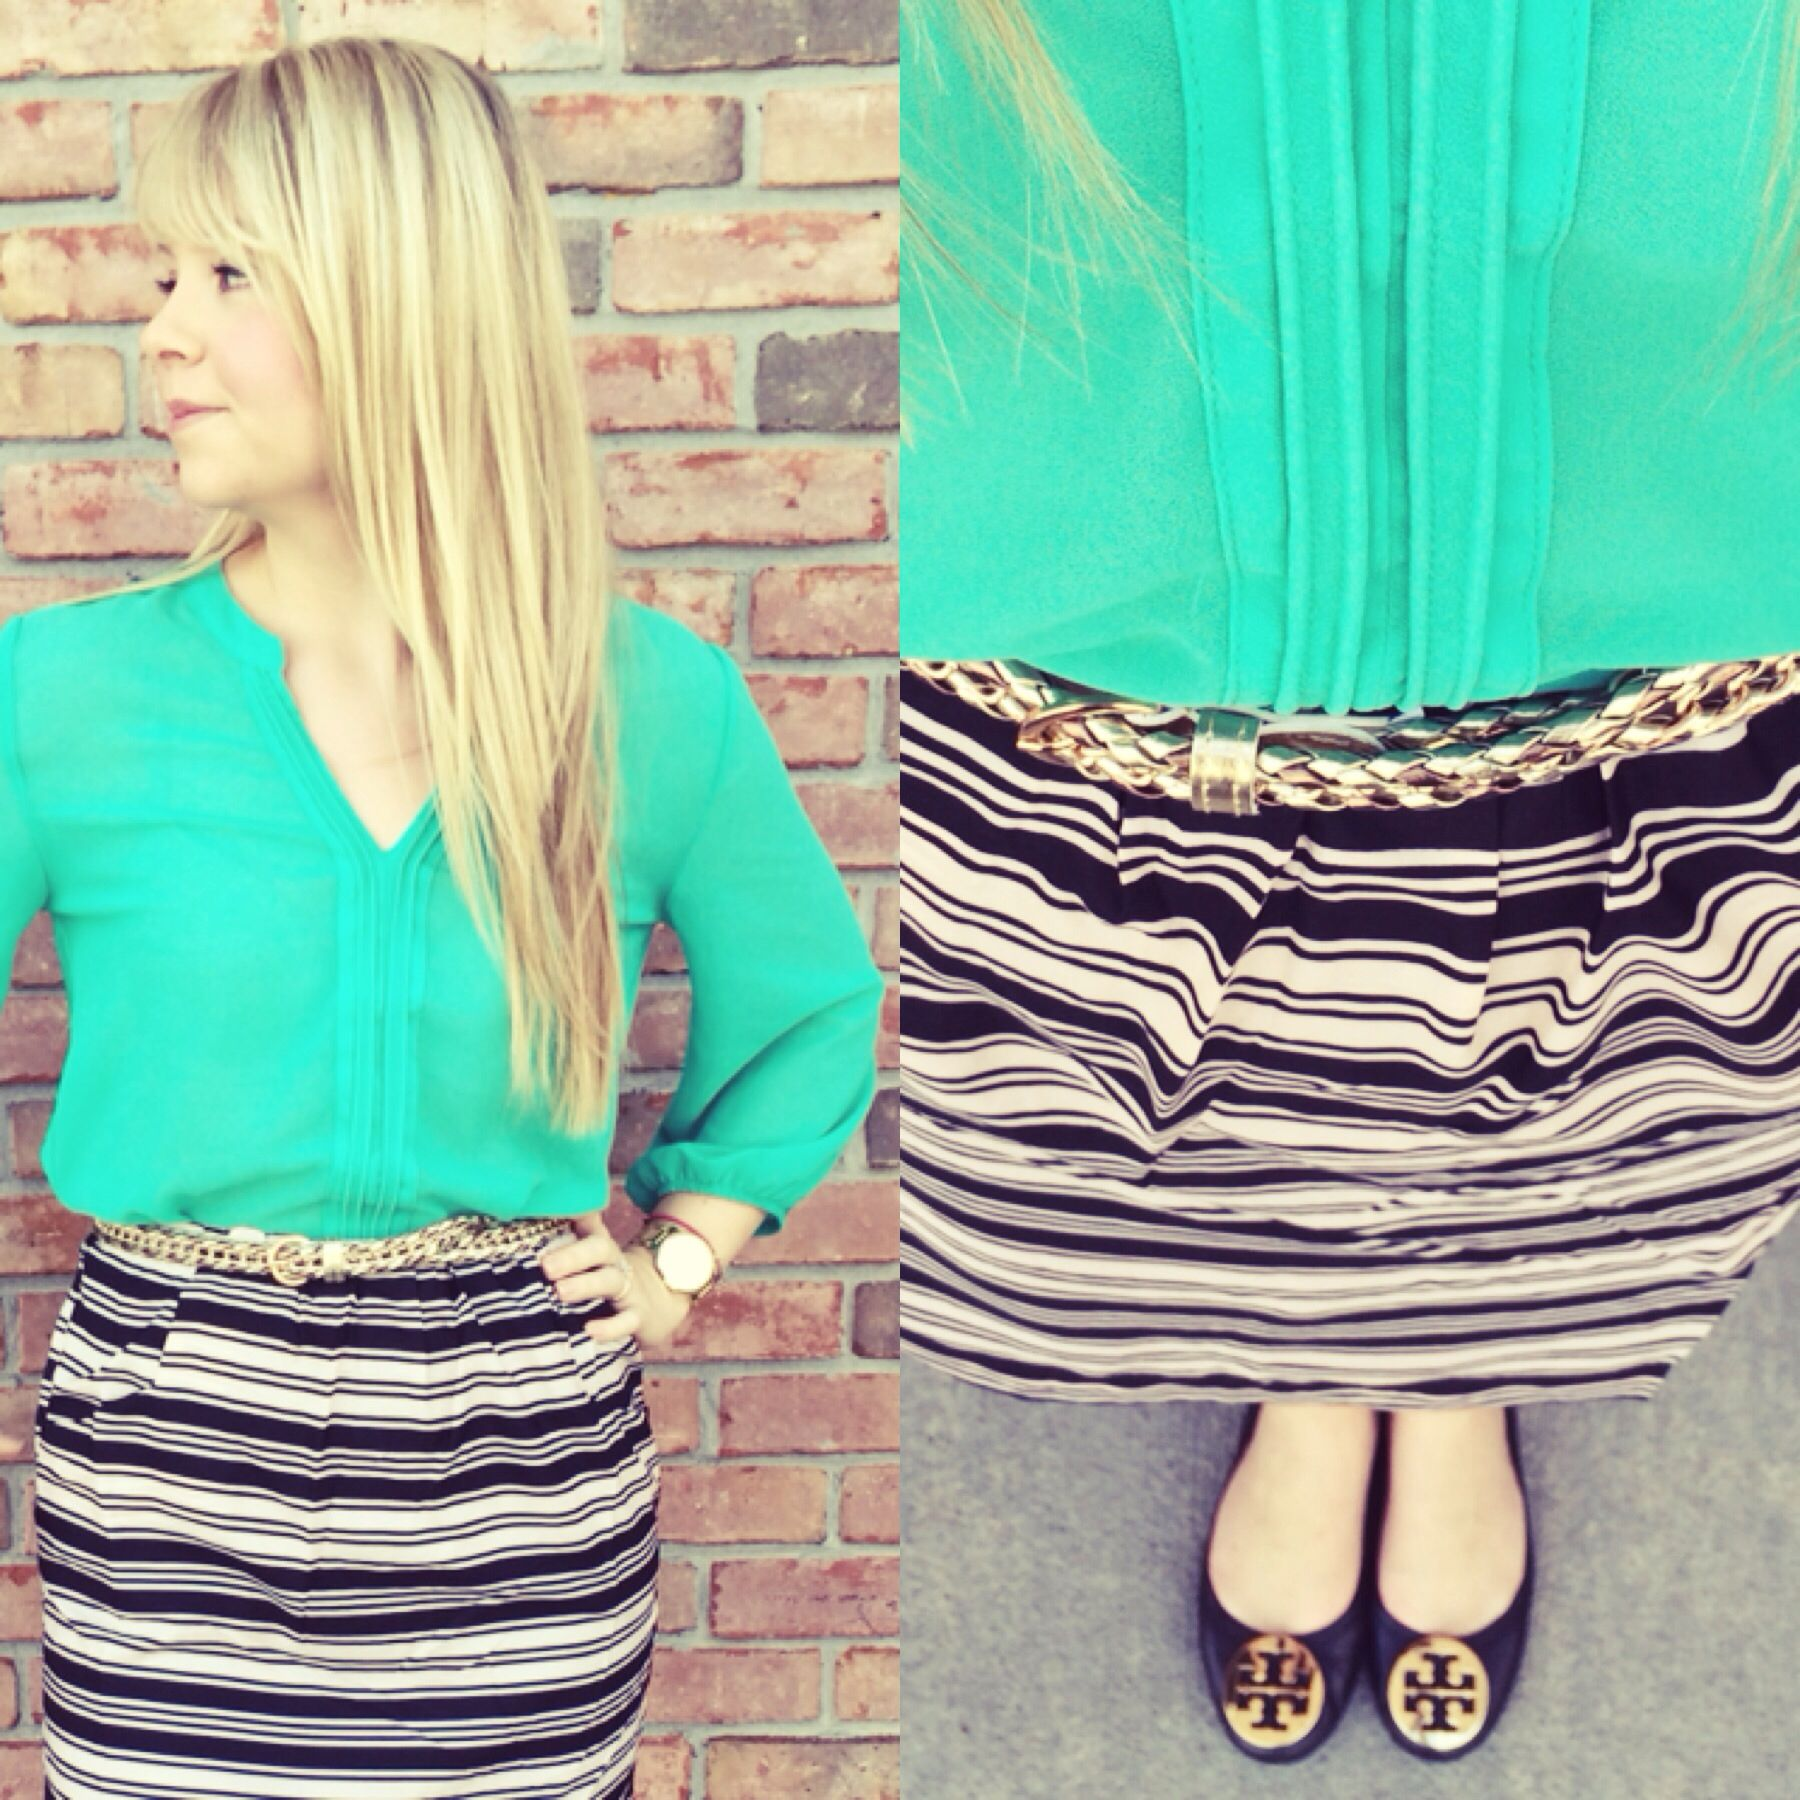 Tory Burch Revas, mint green top, striped skirt, prints